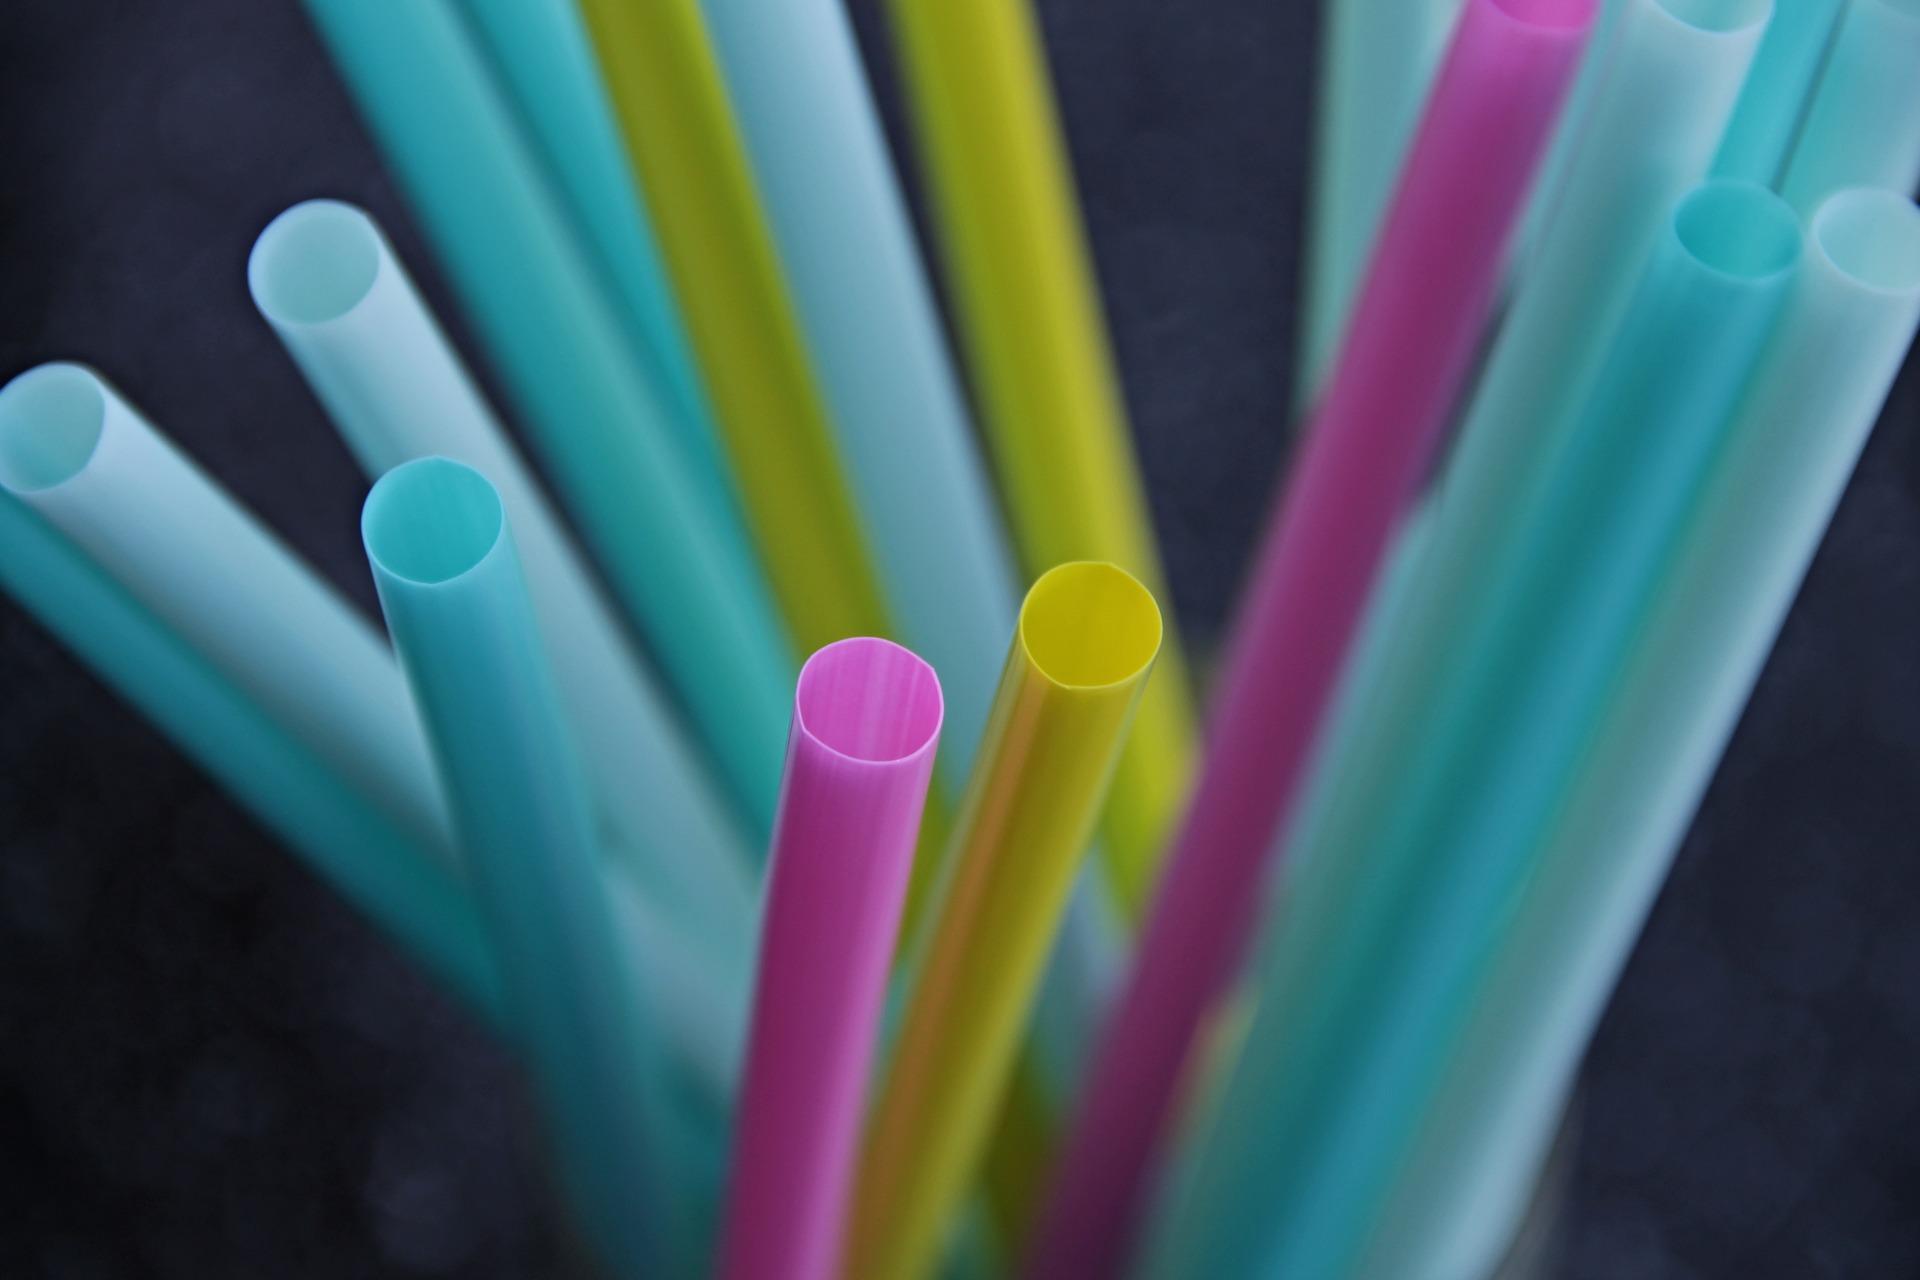 straws-3193715_1920